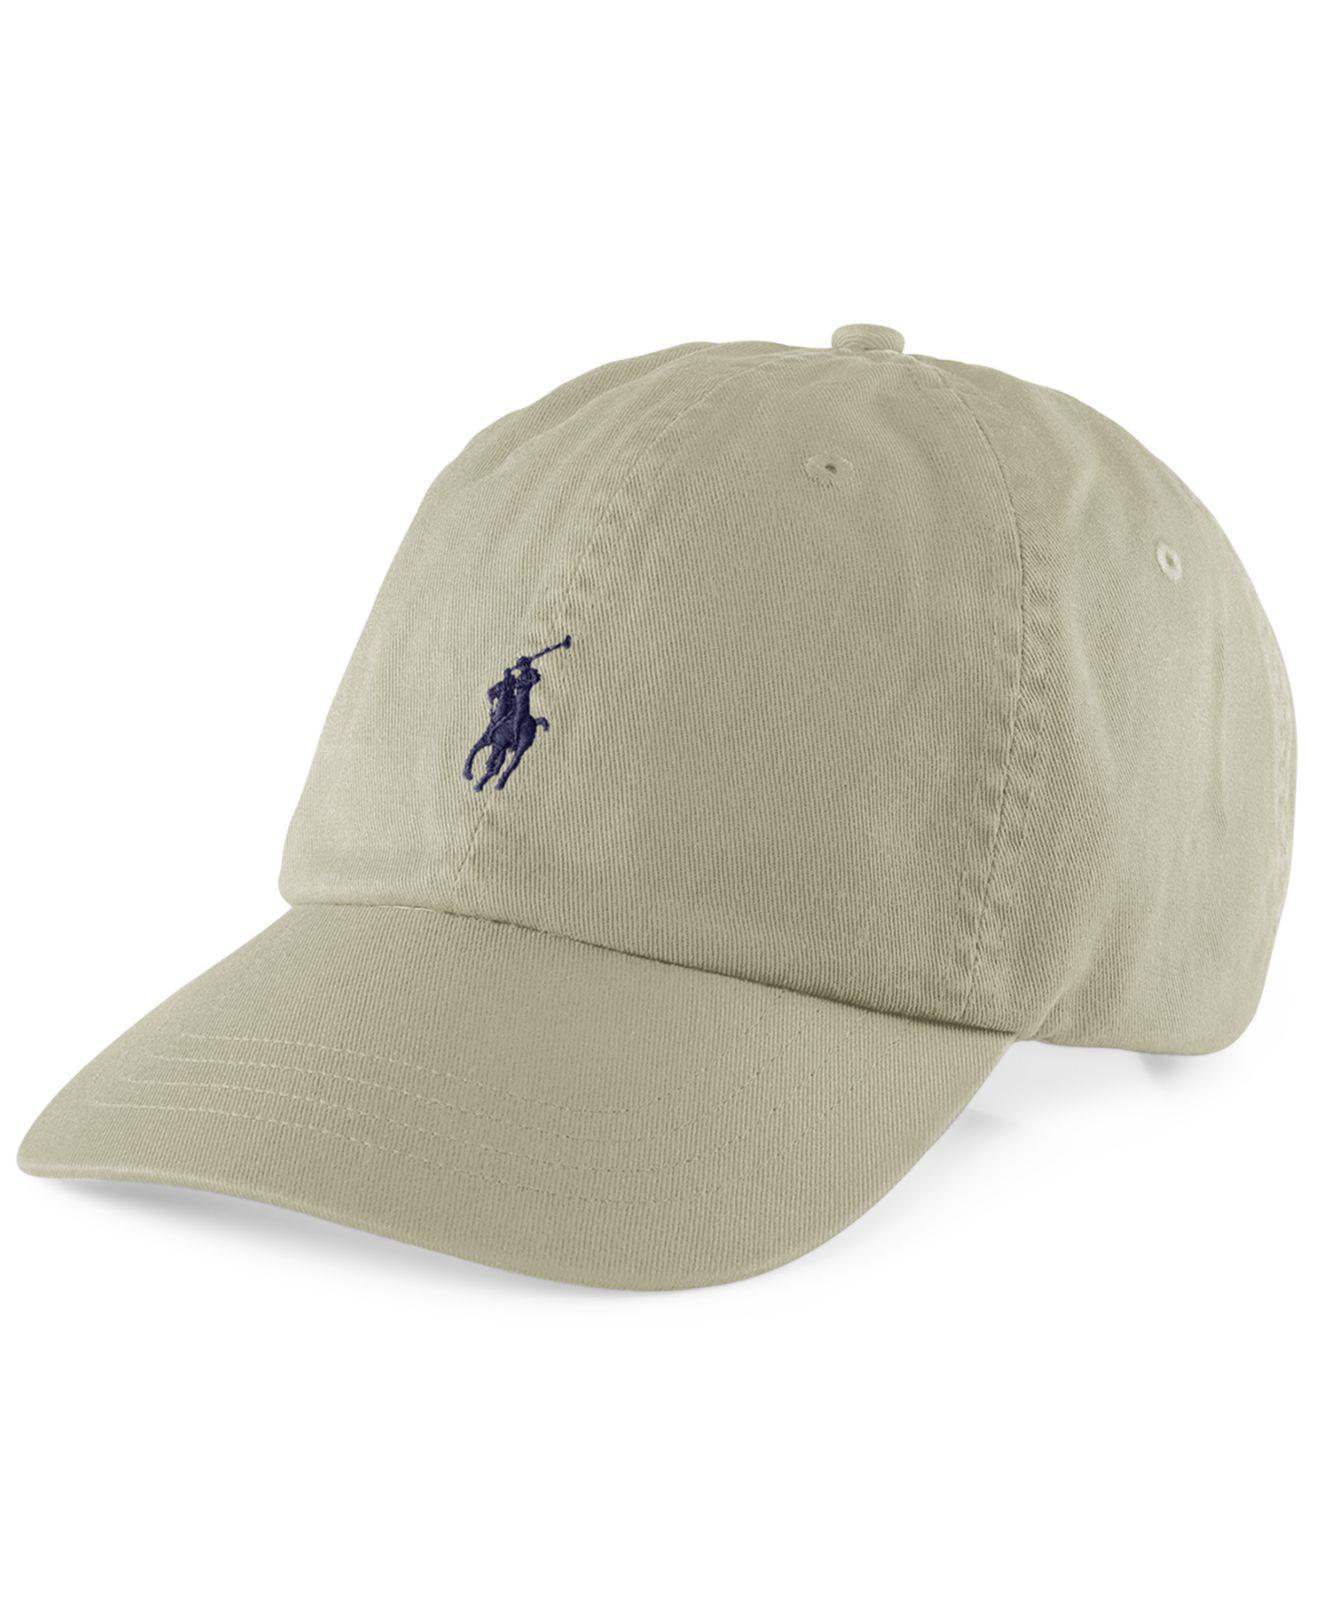 787905748f4 Polo Ralph Lauren - Natural Classic Sport Cap for Men - Lyst. View  fullscreen